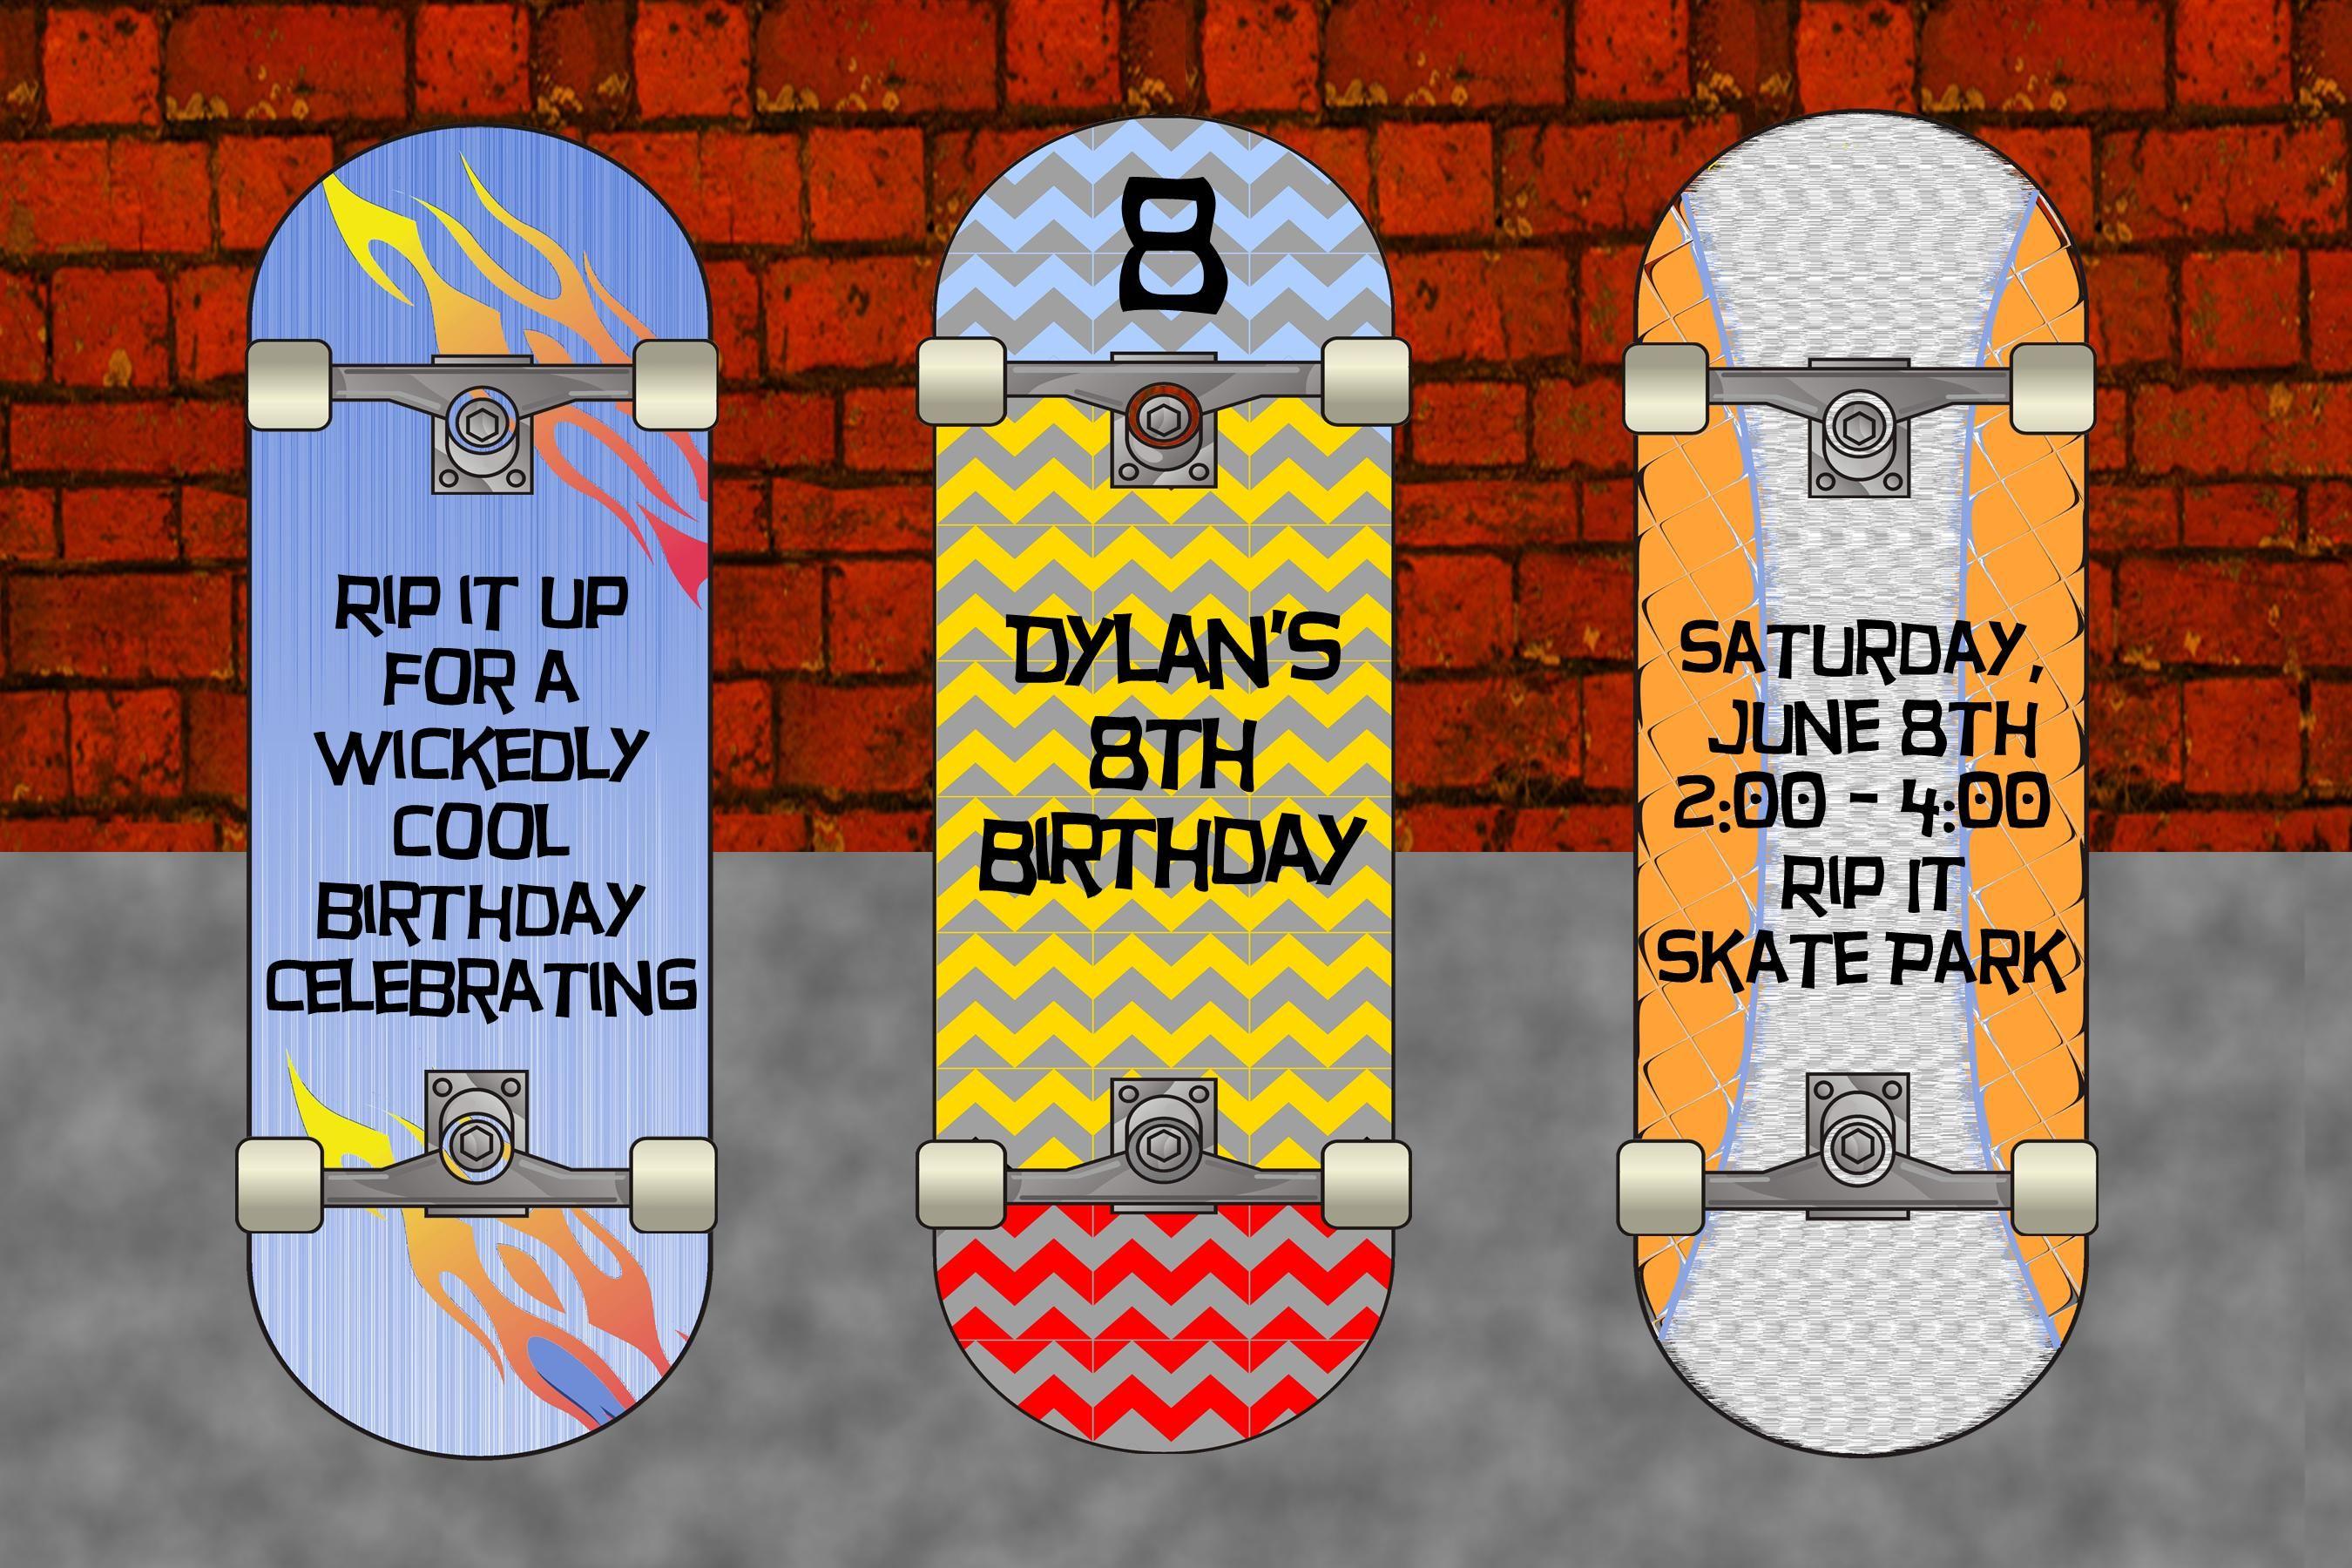 PB Skateboardskateboard party skateboard party invitation – Party Invitation Paper